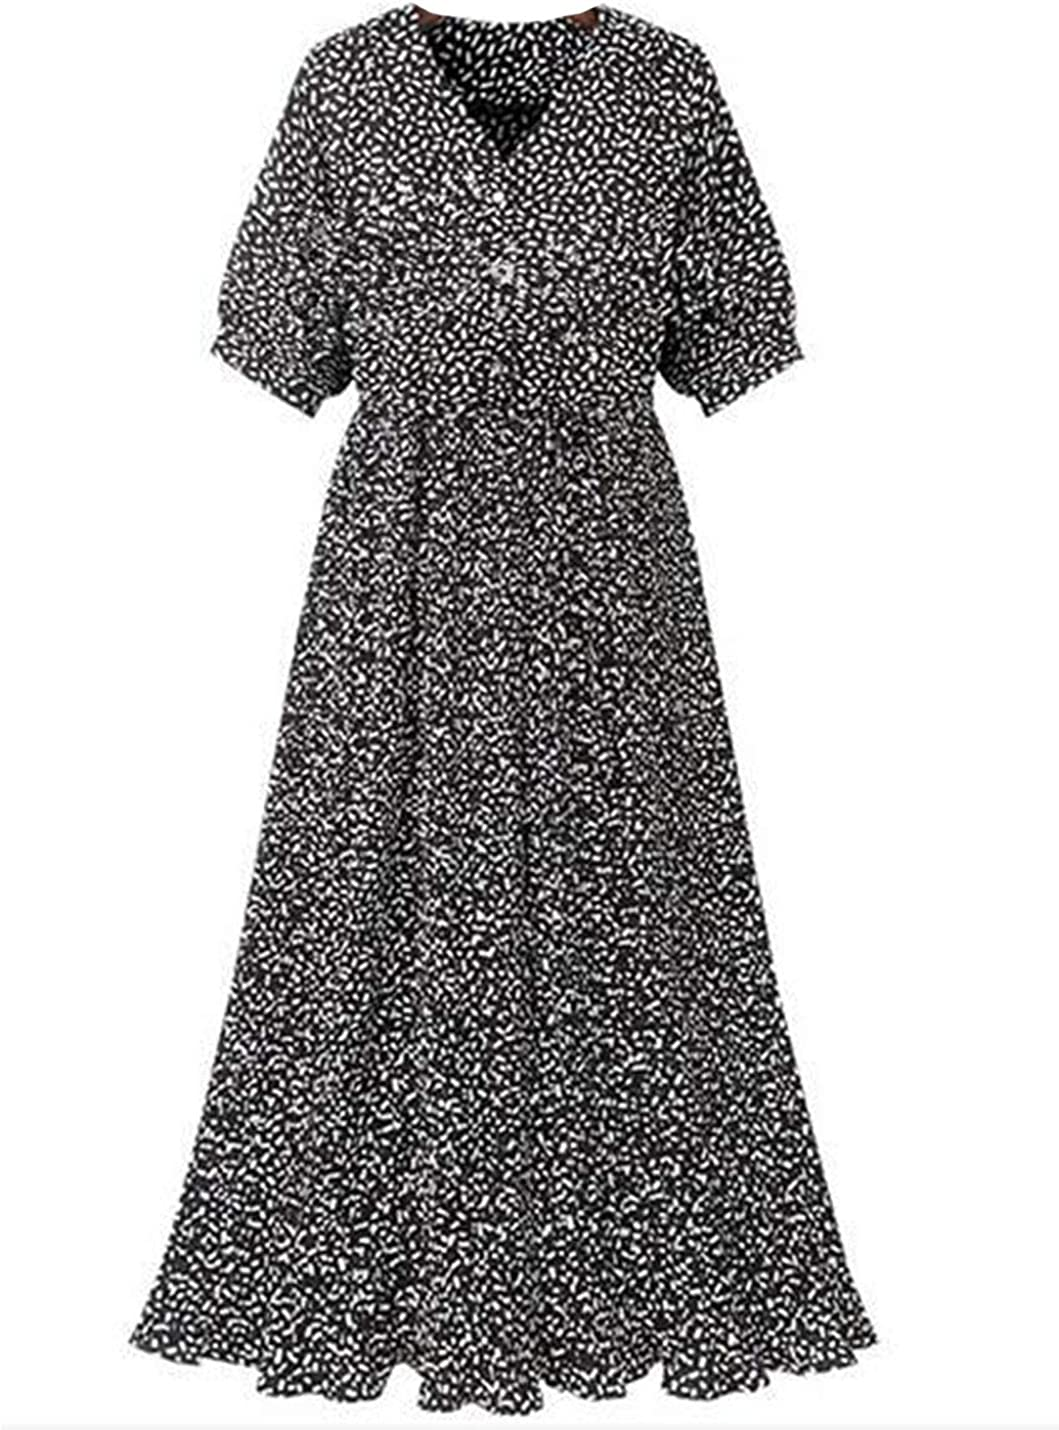 Uaneo Women's Slim Floral V Neck Drawstring Pleated Short Sleeve Midi Dress(Black-L)